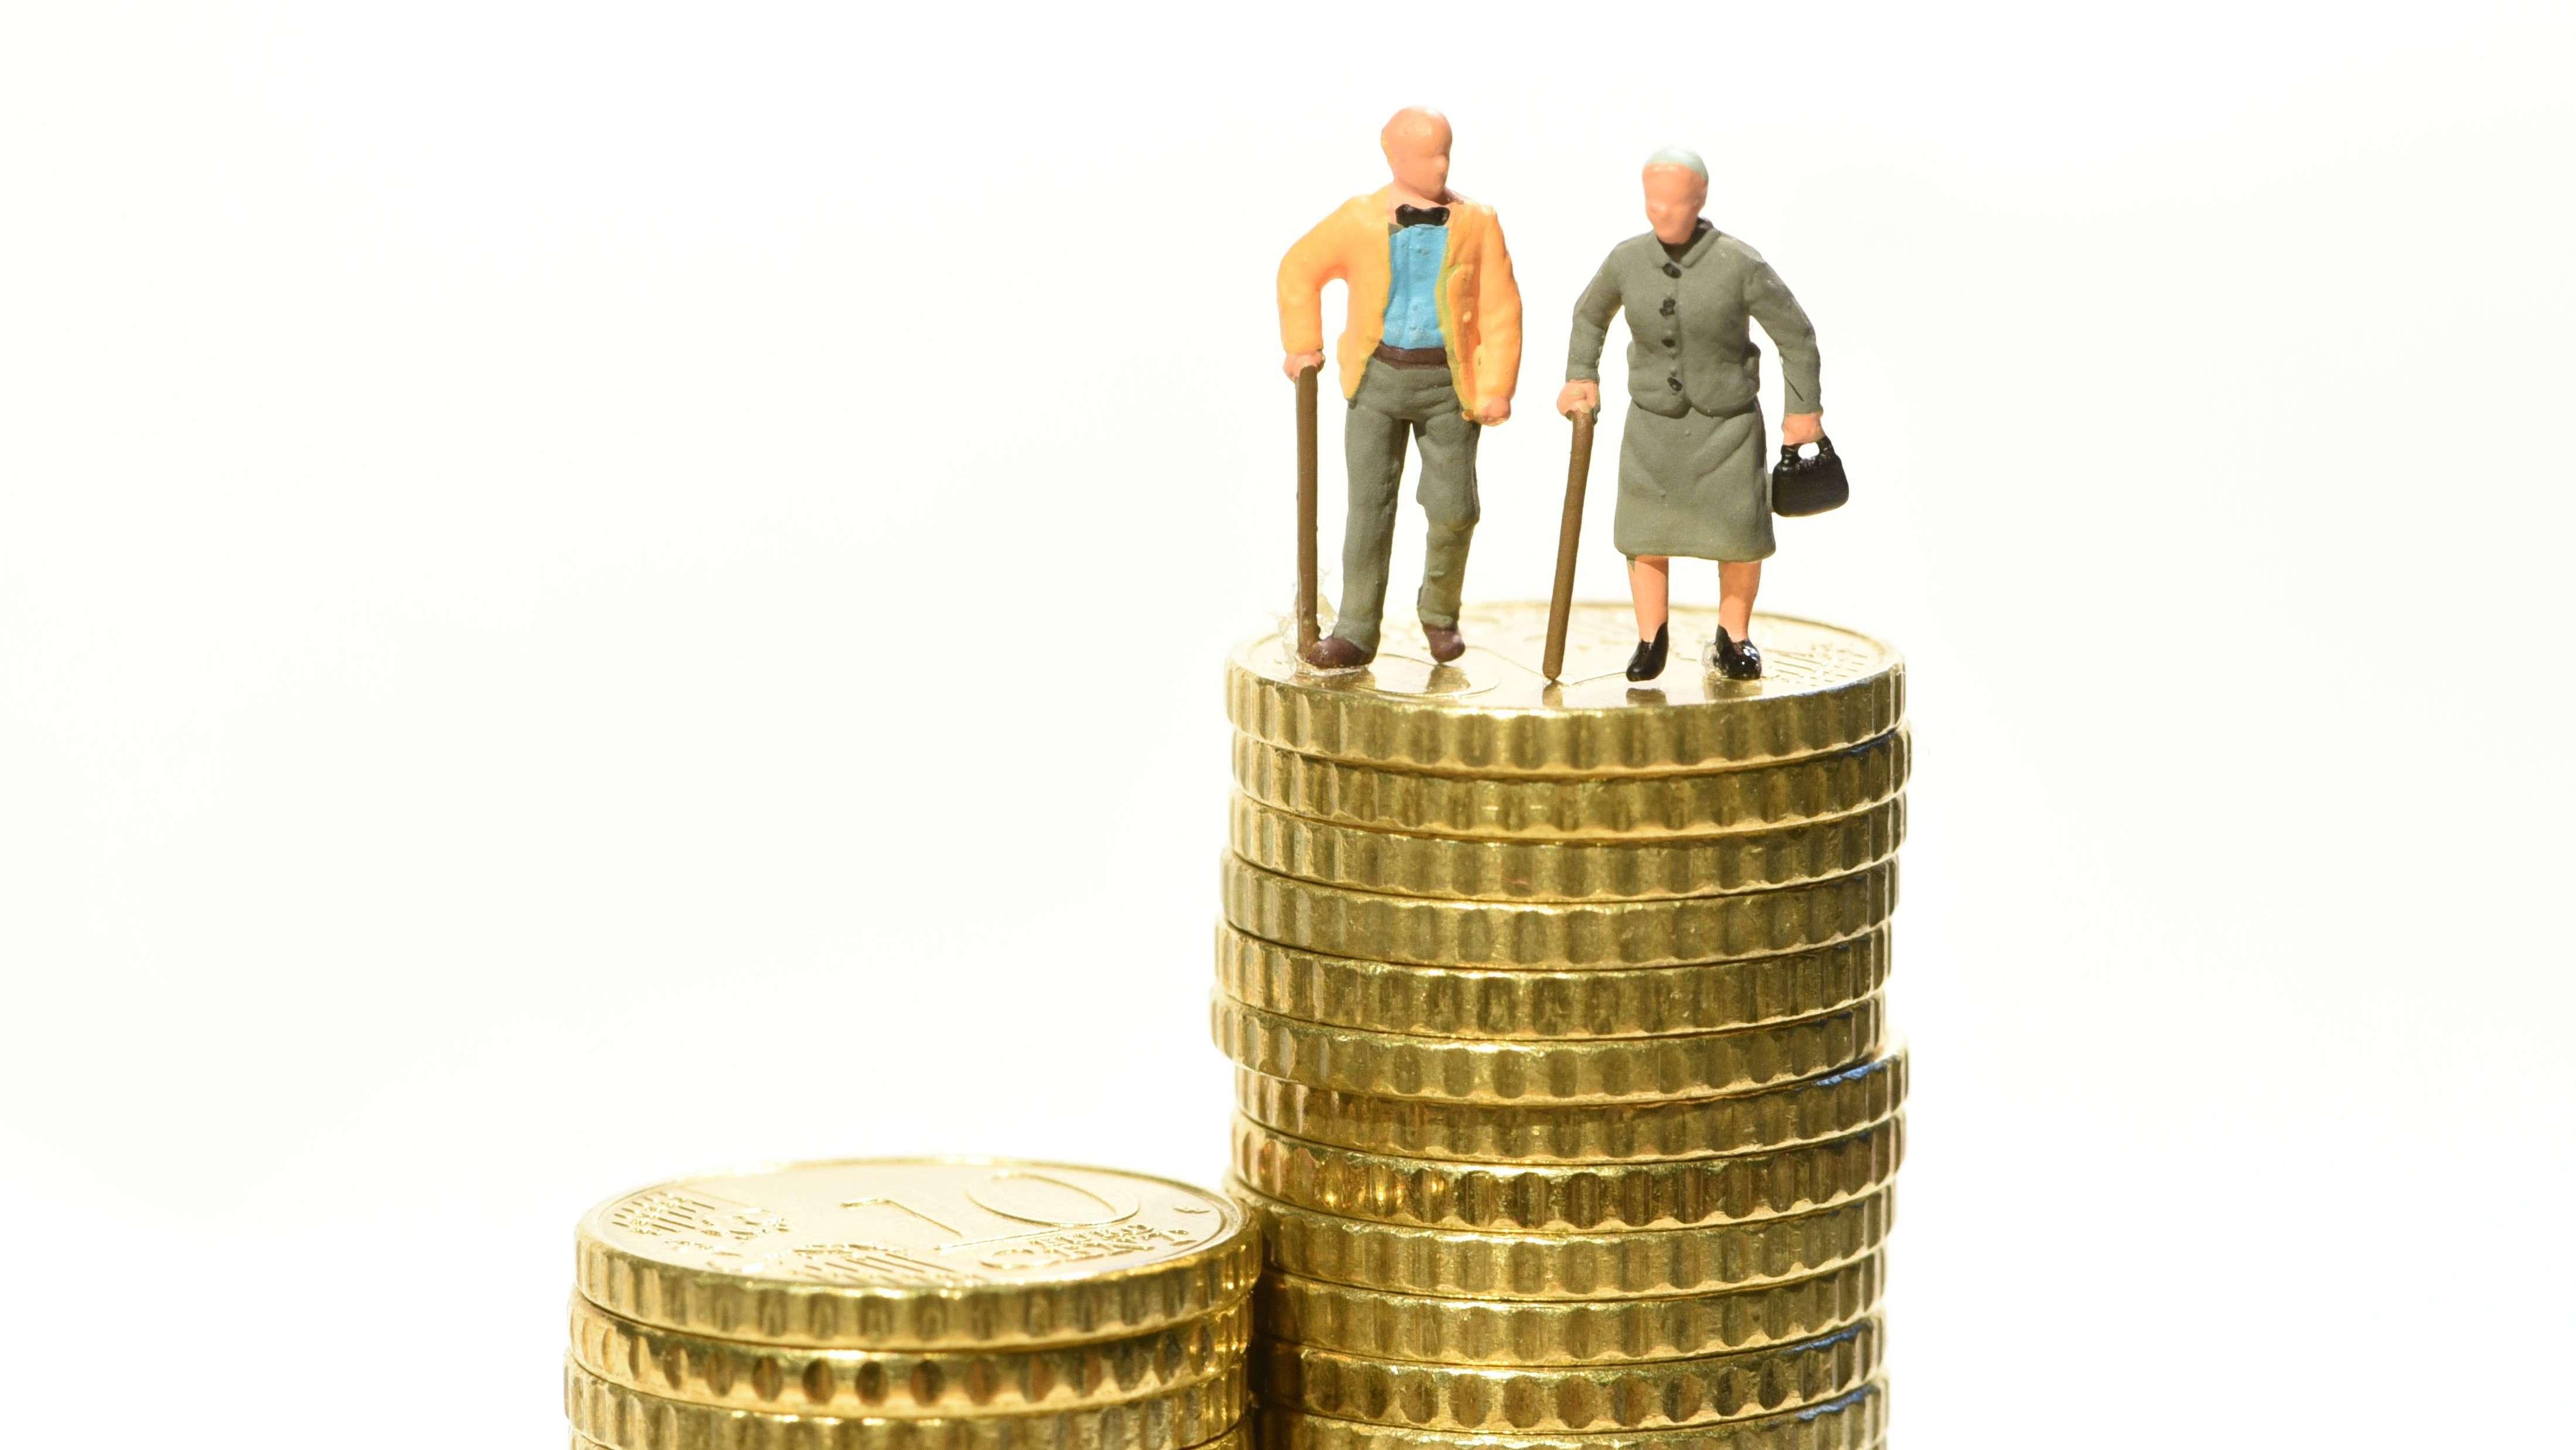 Die Renten werden ab dem 1.7.2019 angehoben